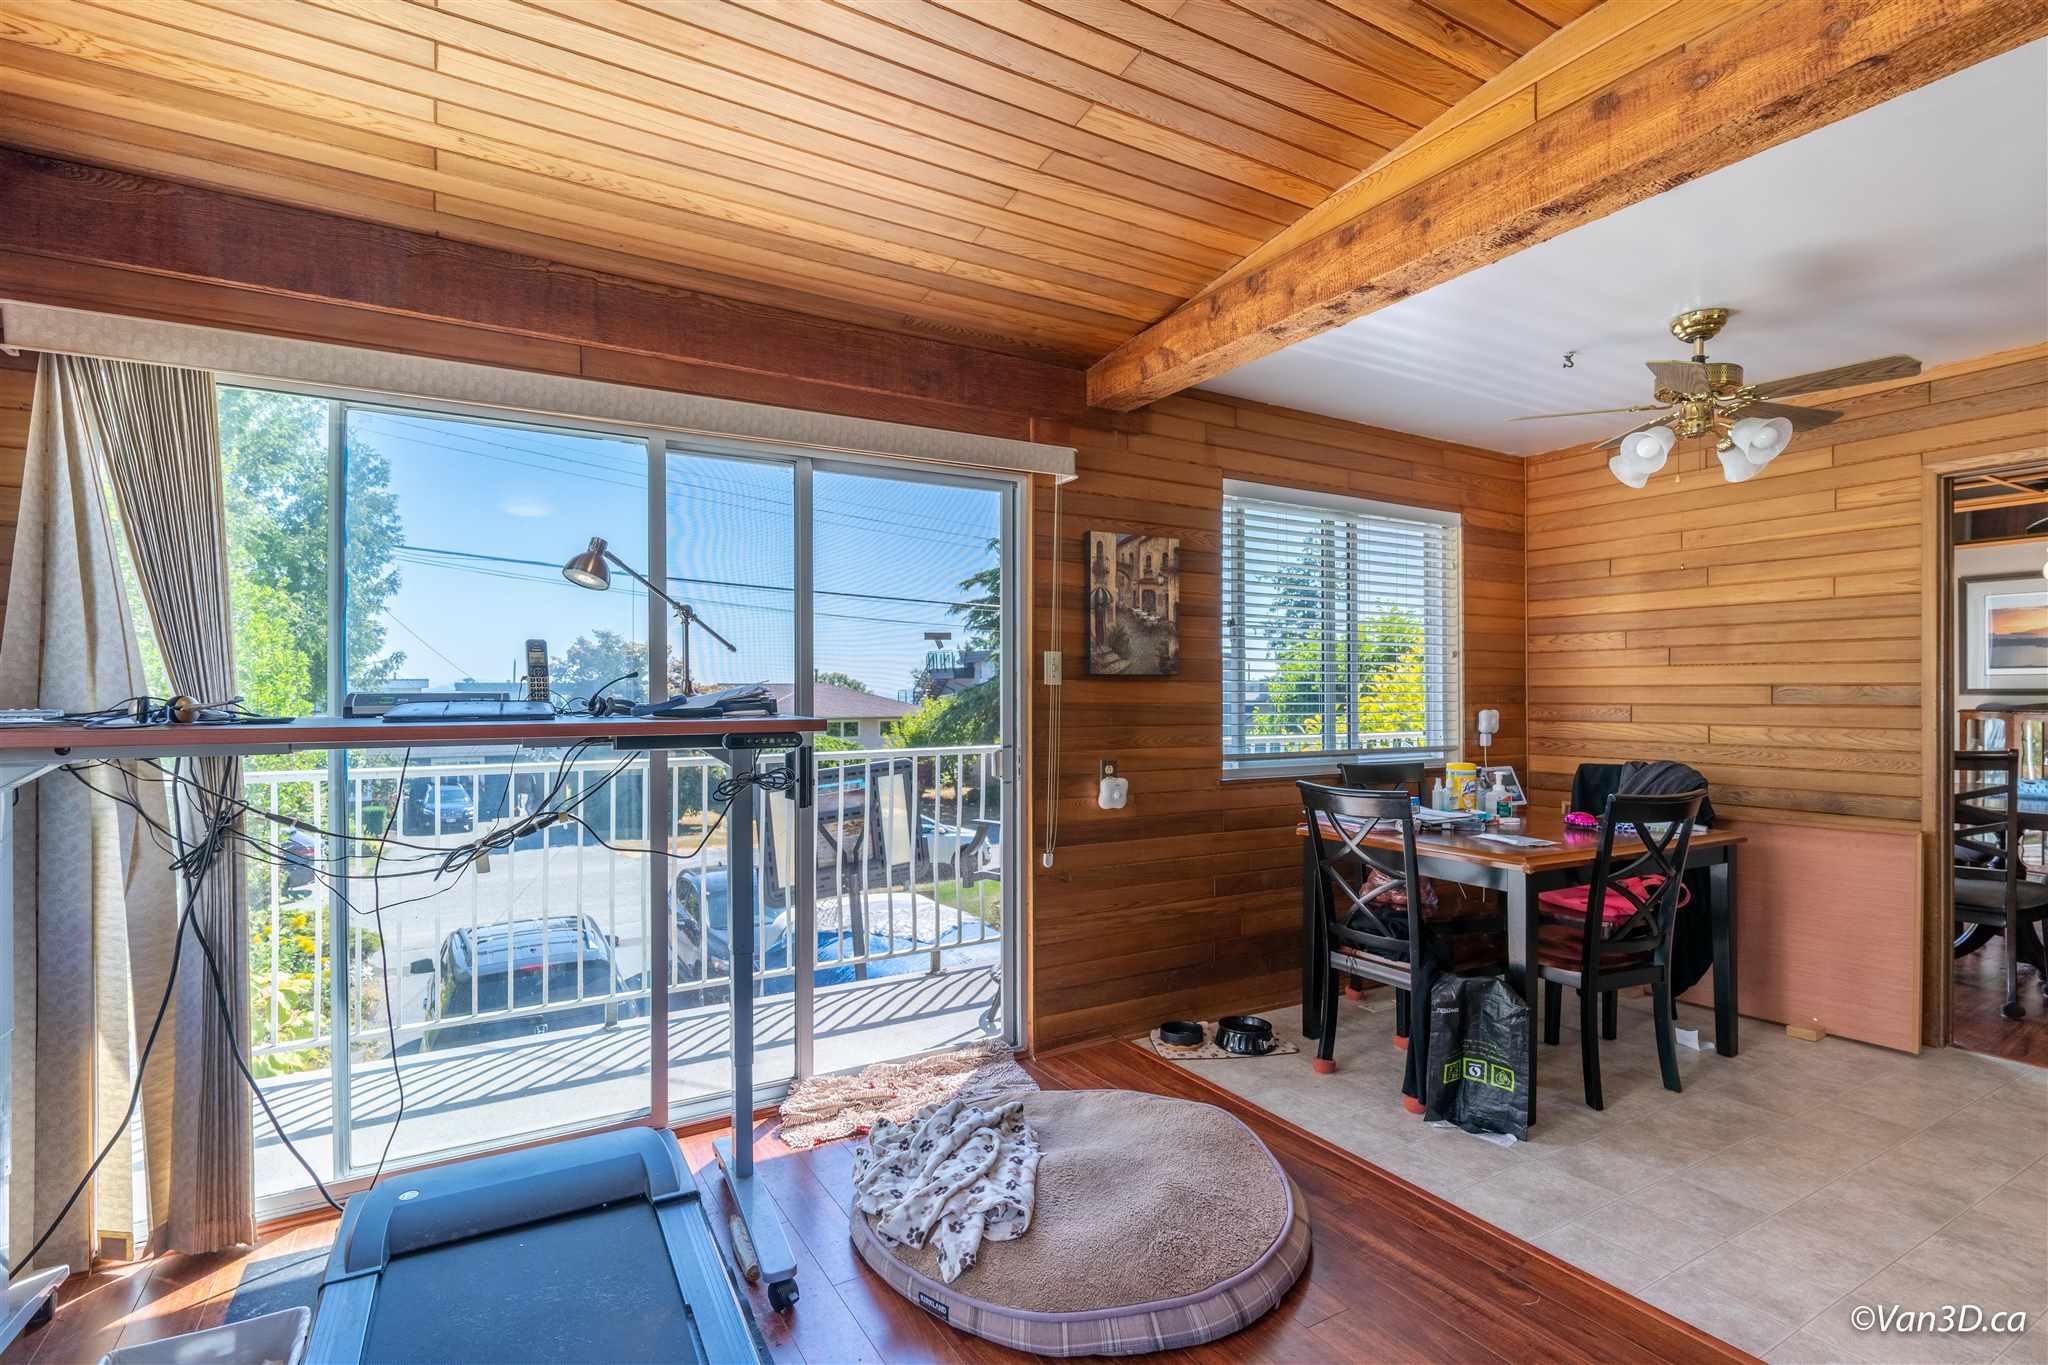 14495 MANN PARK CRESCENT - White Rock House/Single Family for sale, 4 Bedrooms (R2604561) - #28